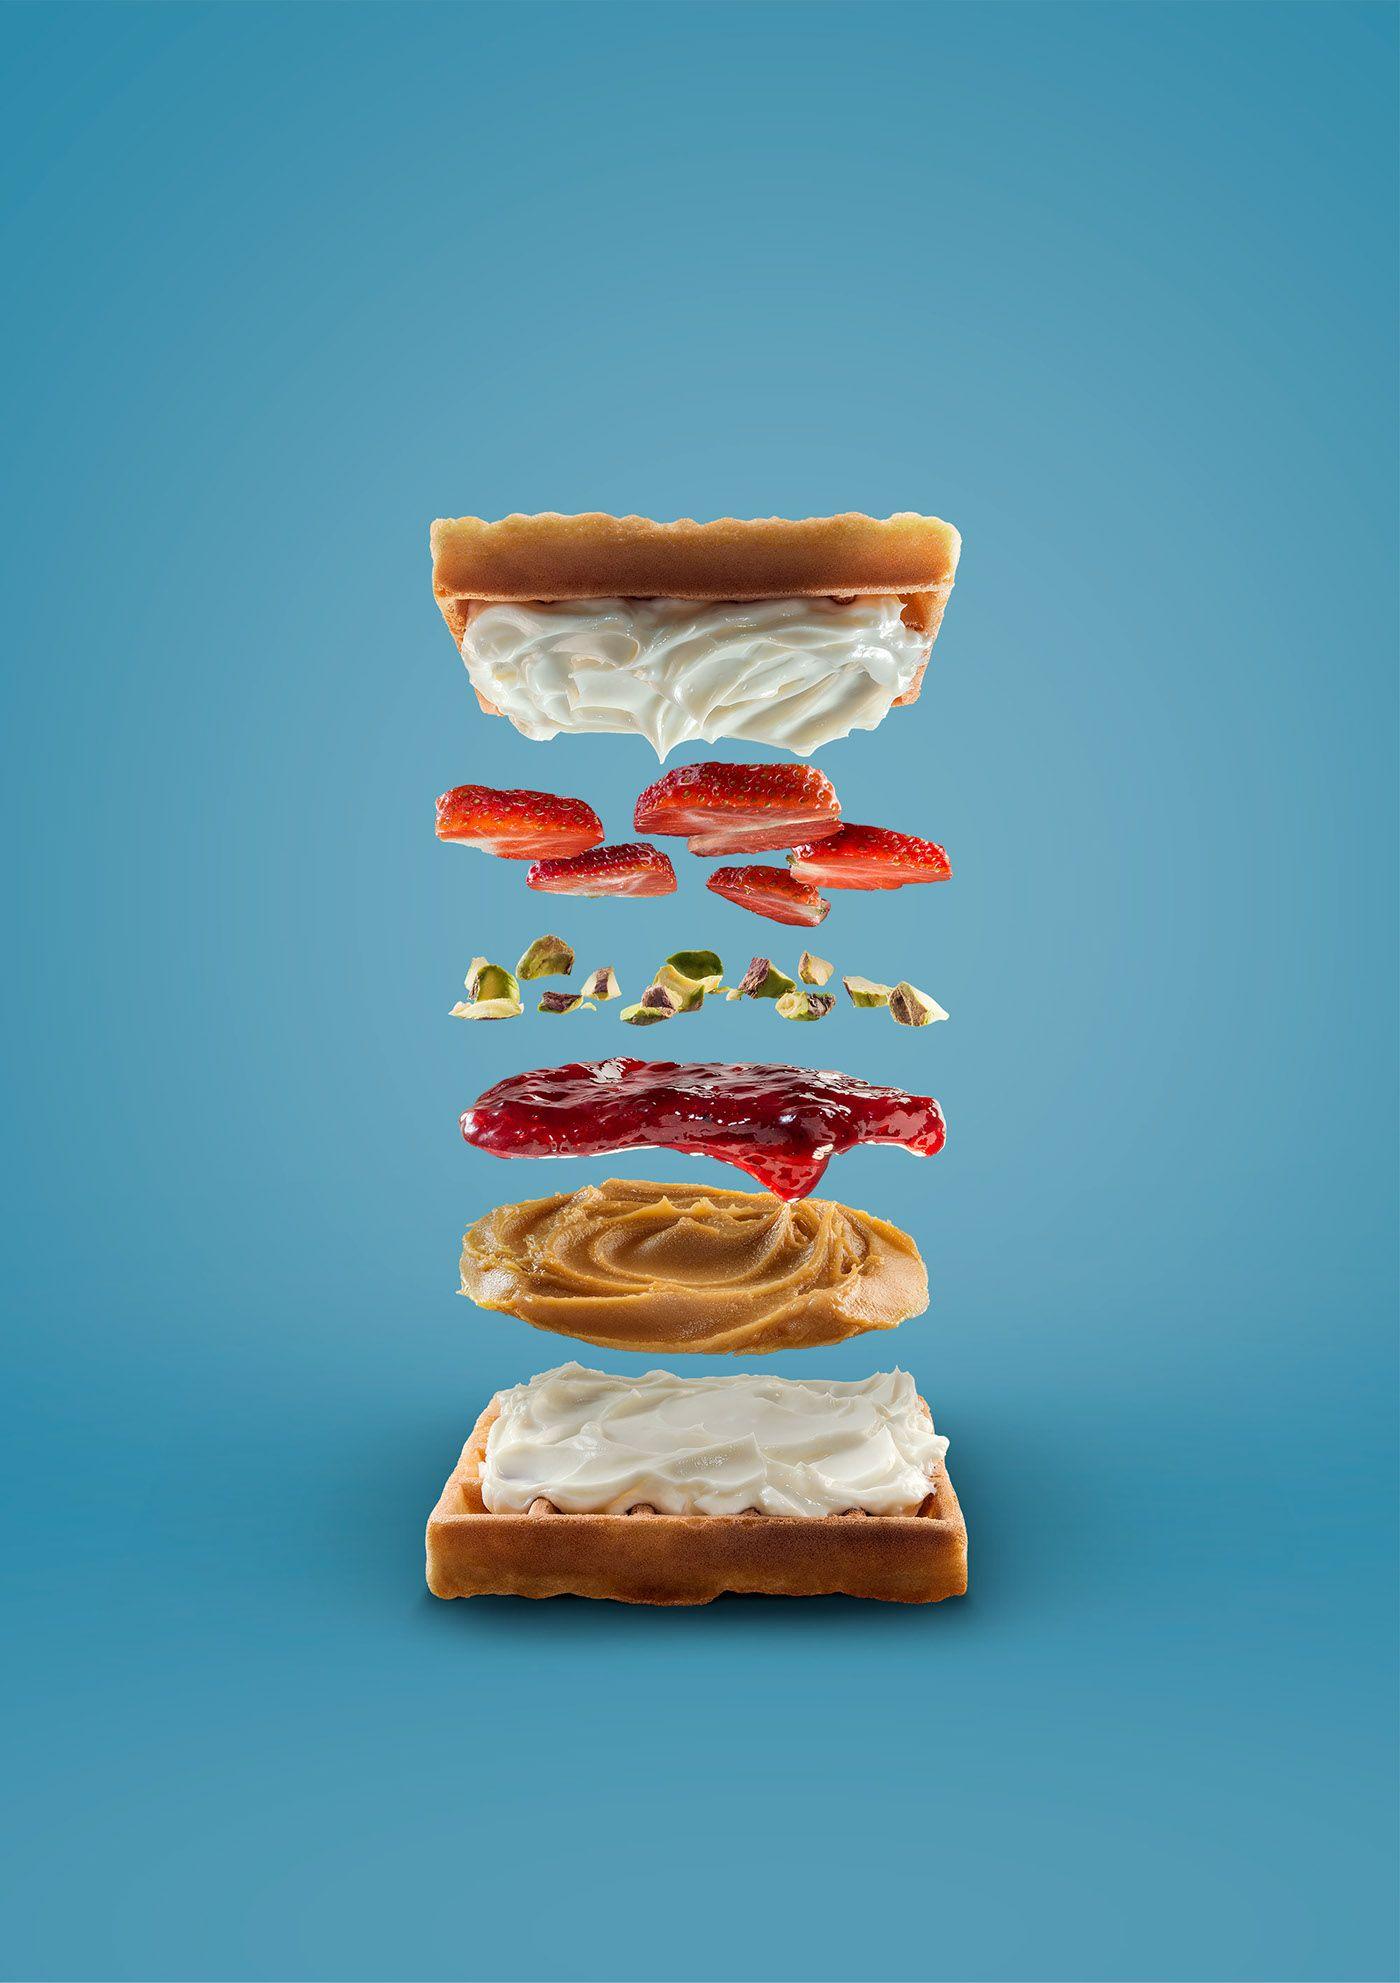 Sandwiches deconstructed on Behance | Food Photo & 3D | Pinterest ...